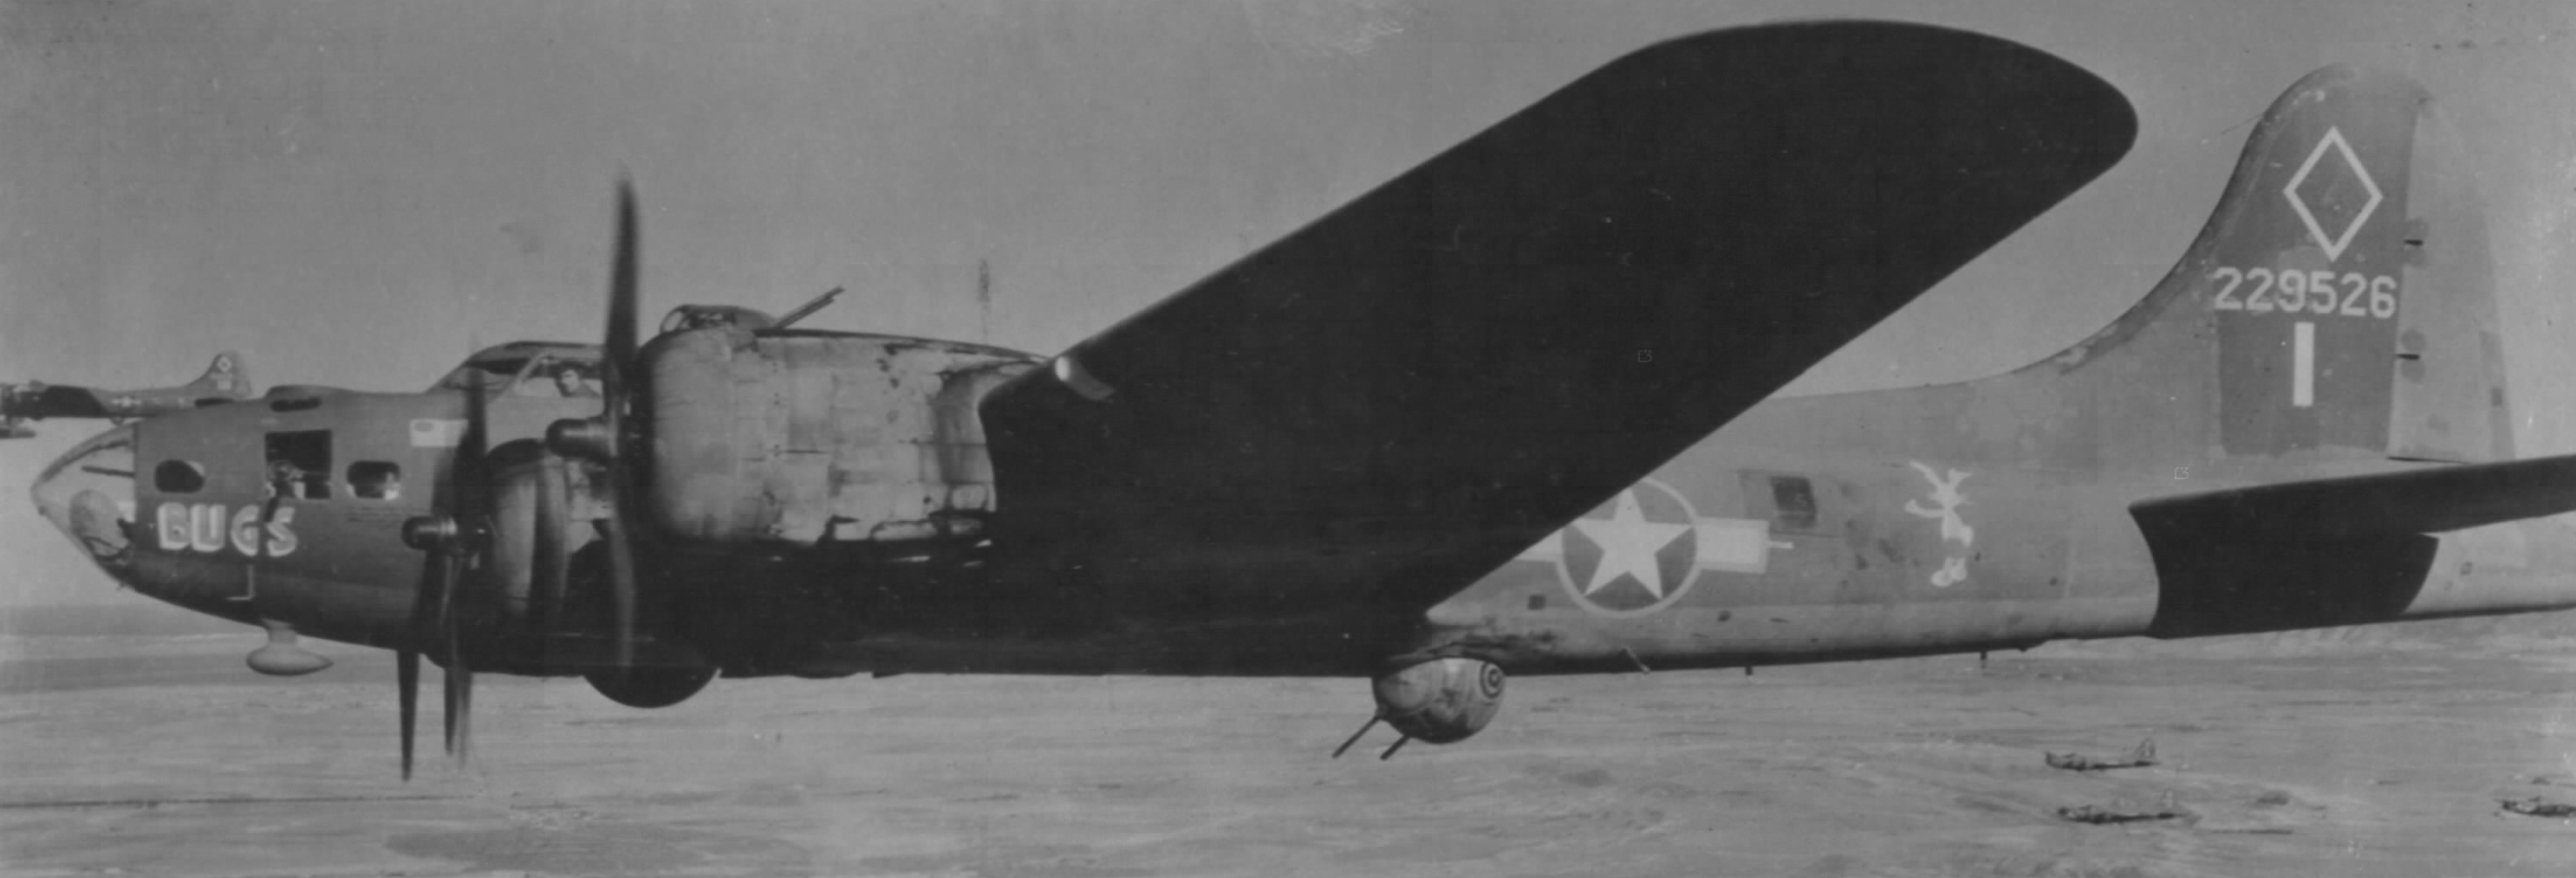 B-17 42-29526